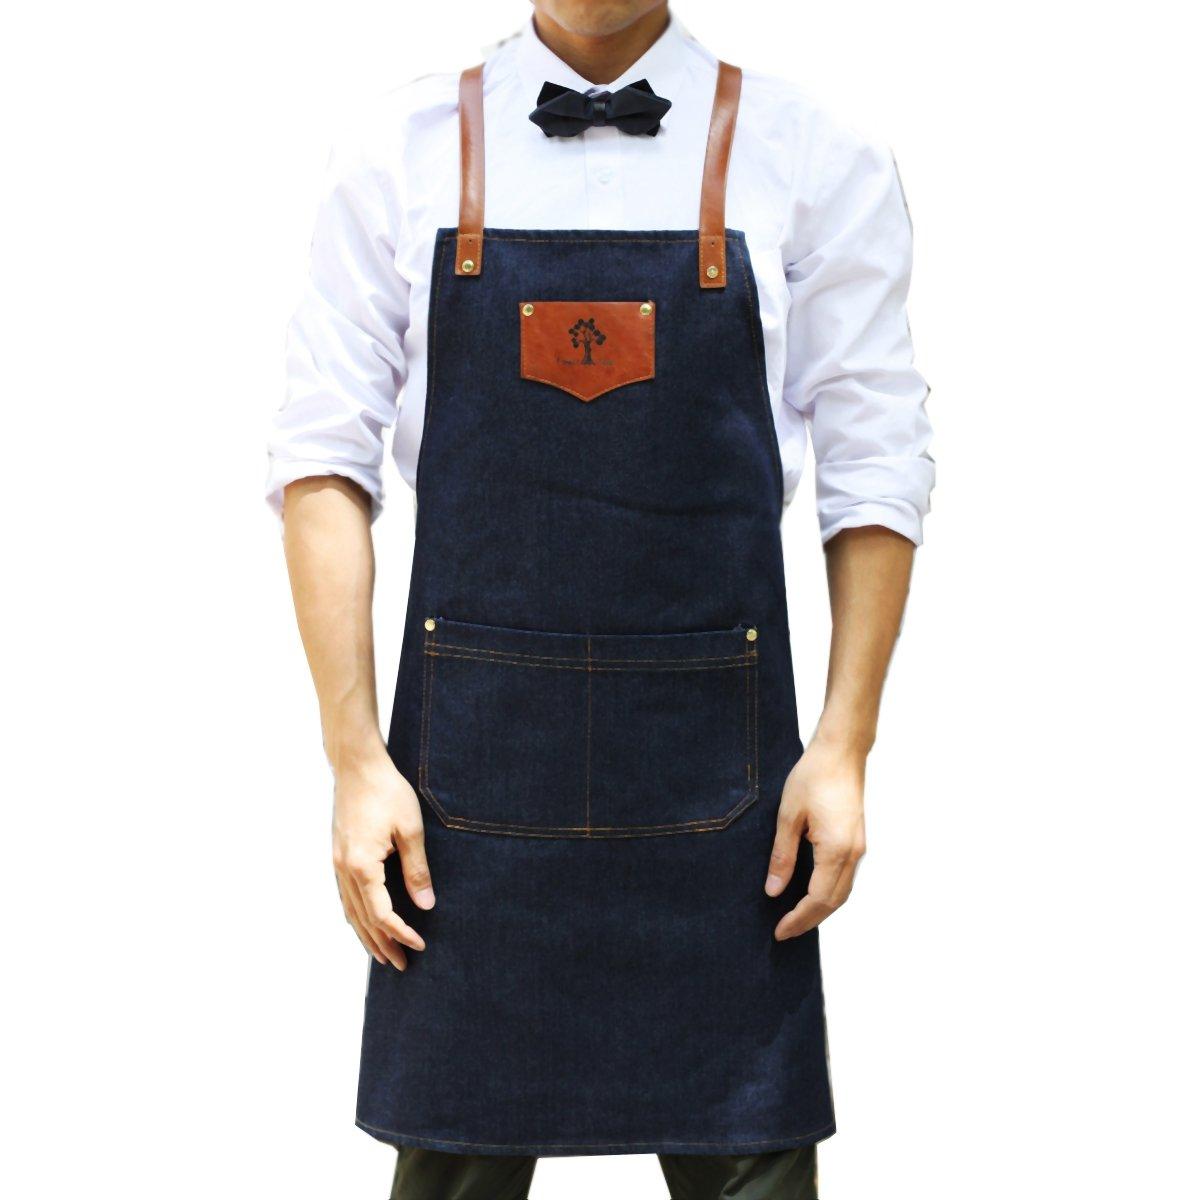 Denim Chef Shop Apron with Pockets VANORIG Durable & Comfortable